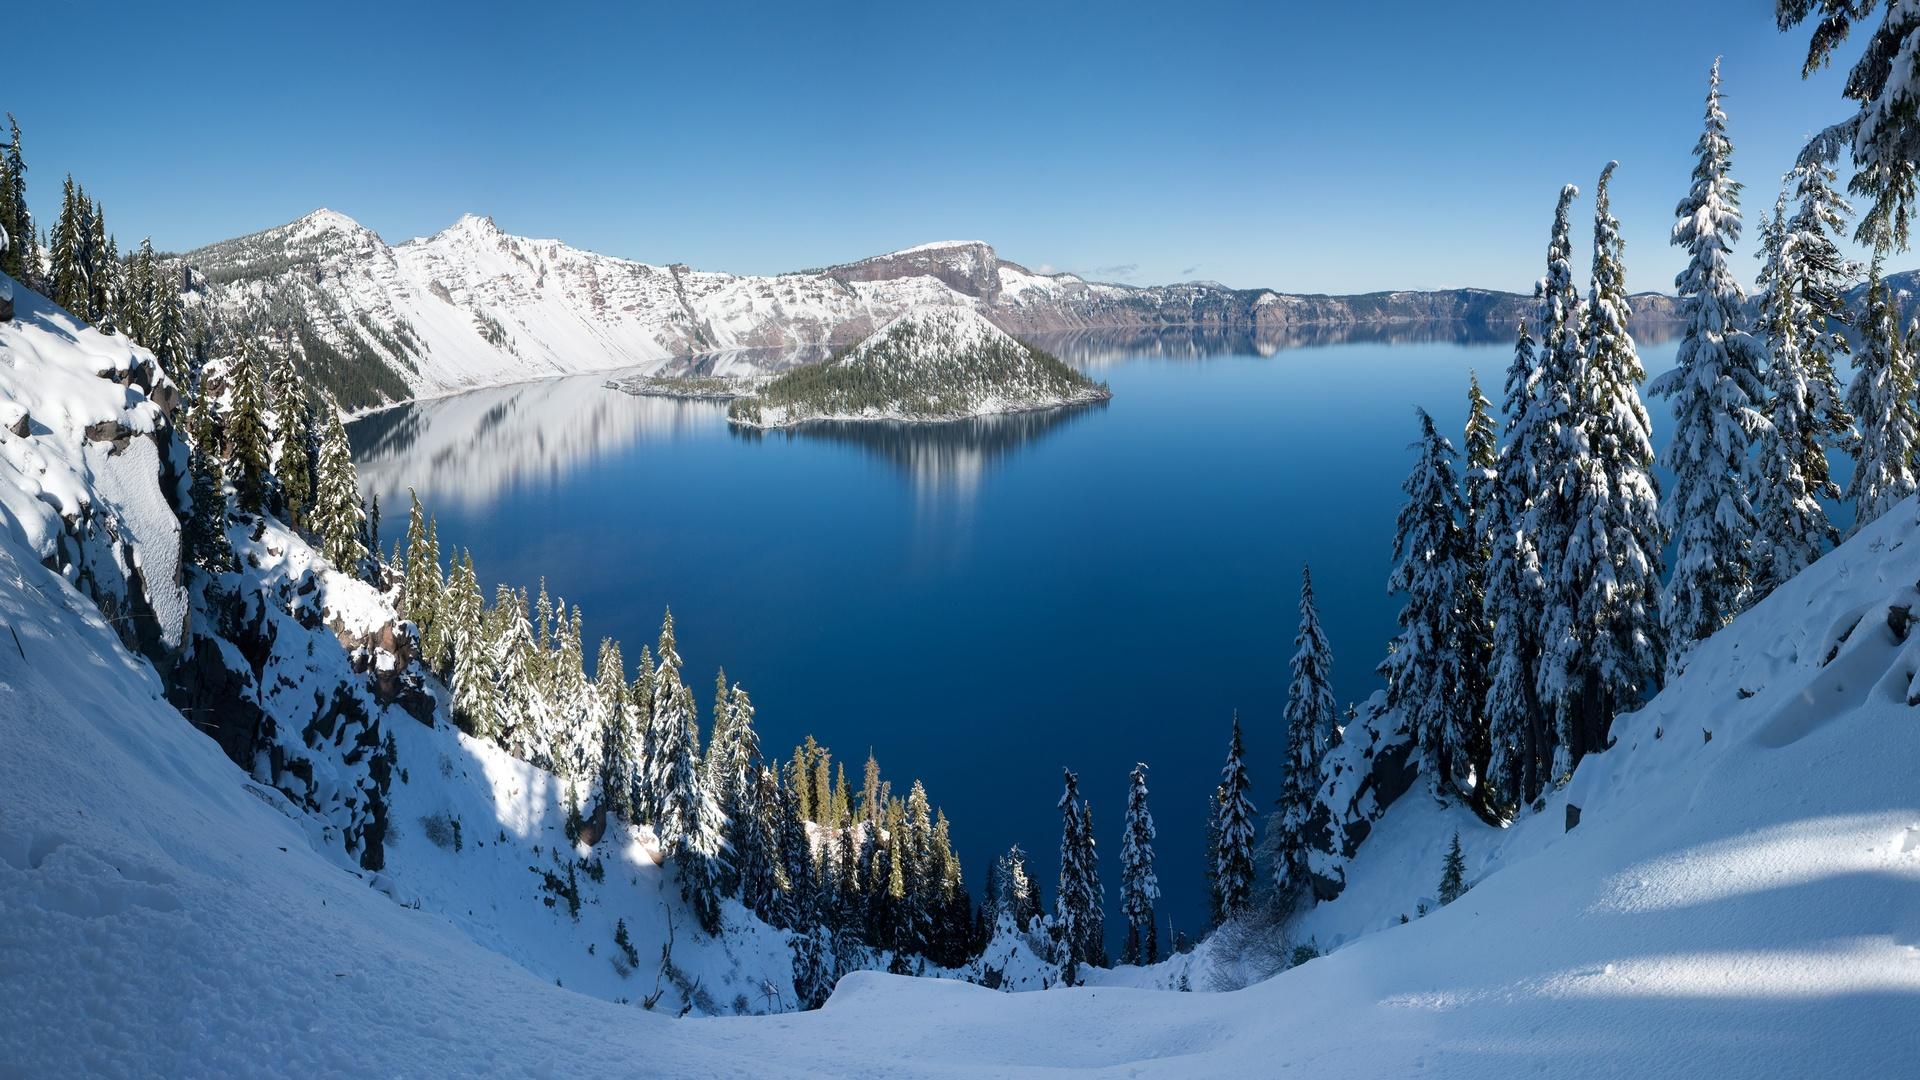 крайтер, орегон, кратерное озеро, снег, зима, деревья, остров